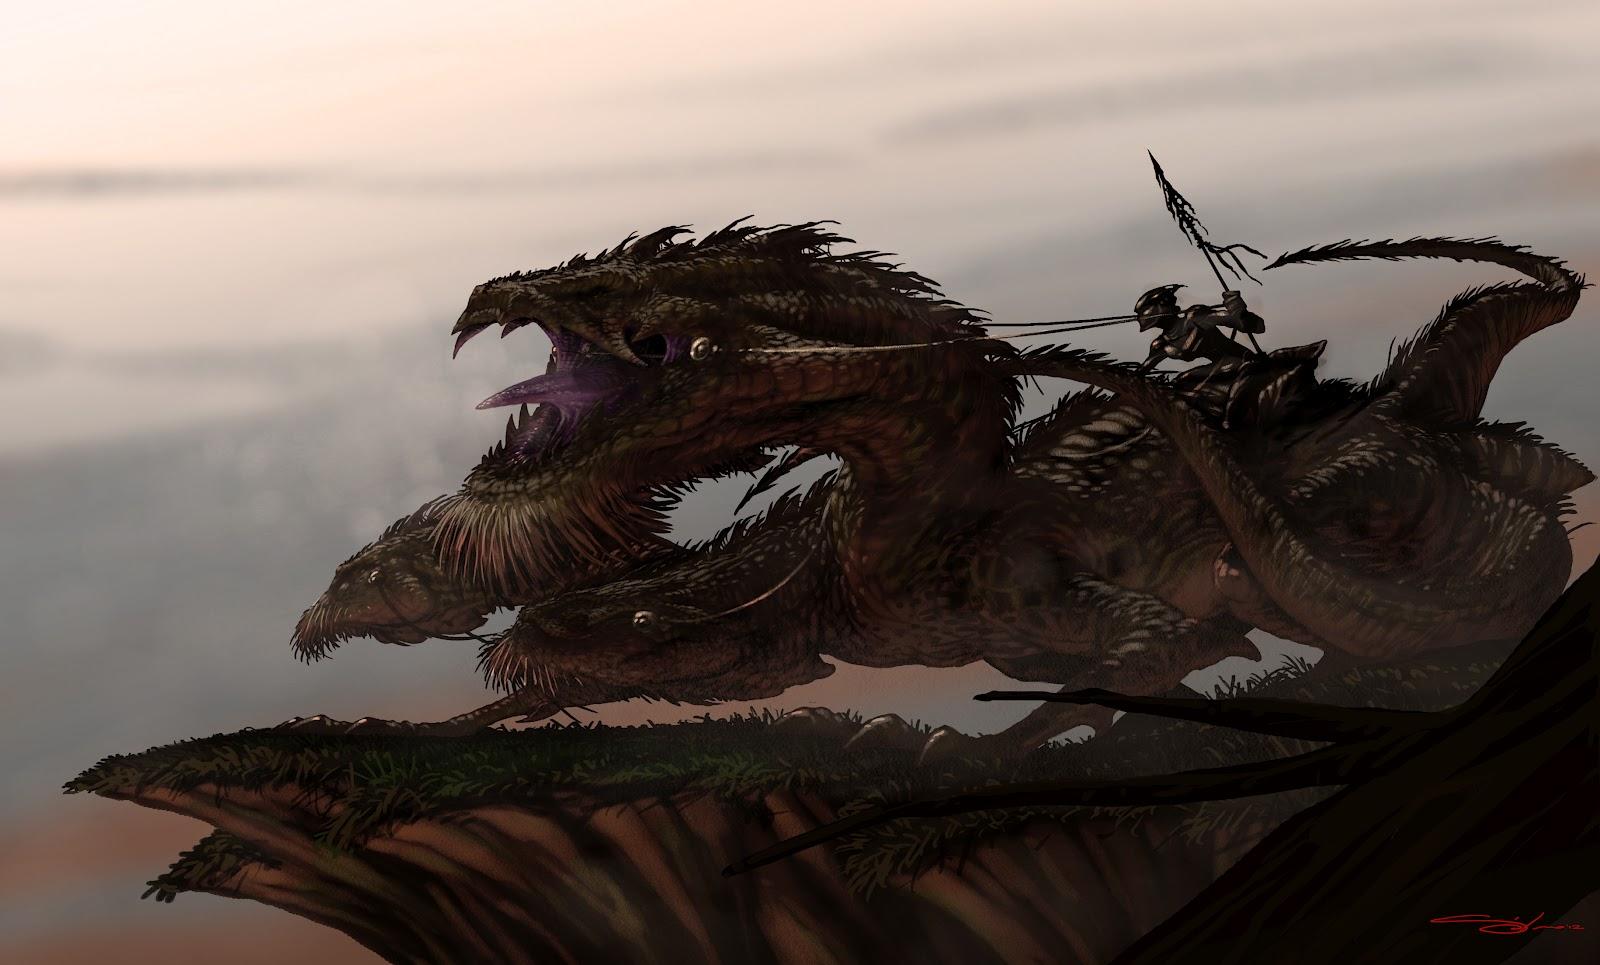 Frame slowpainting dragoon